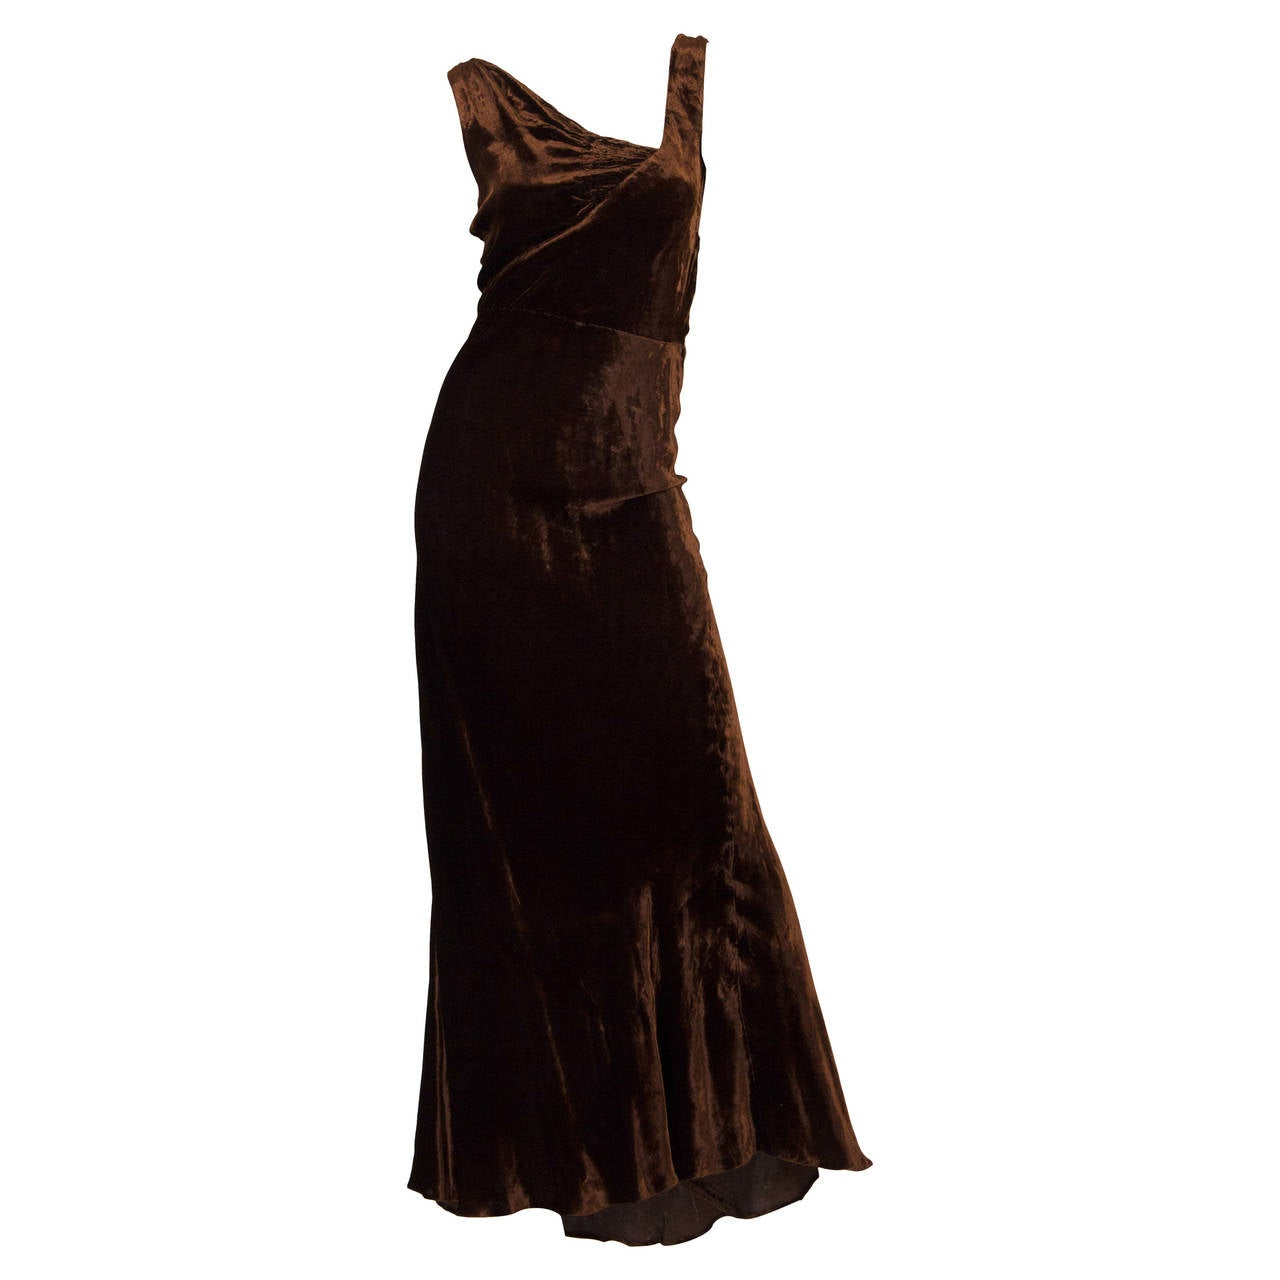 1930s Bias Cut Silk Velvet Gown For Sale at 1stdibs